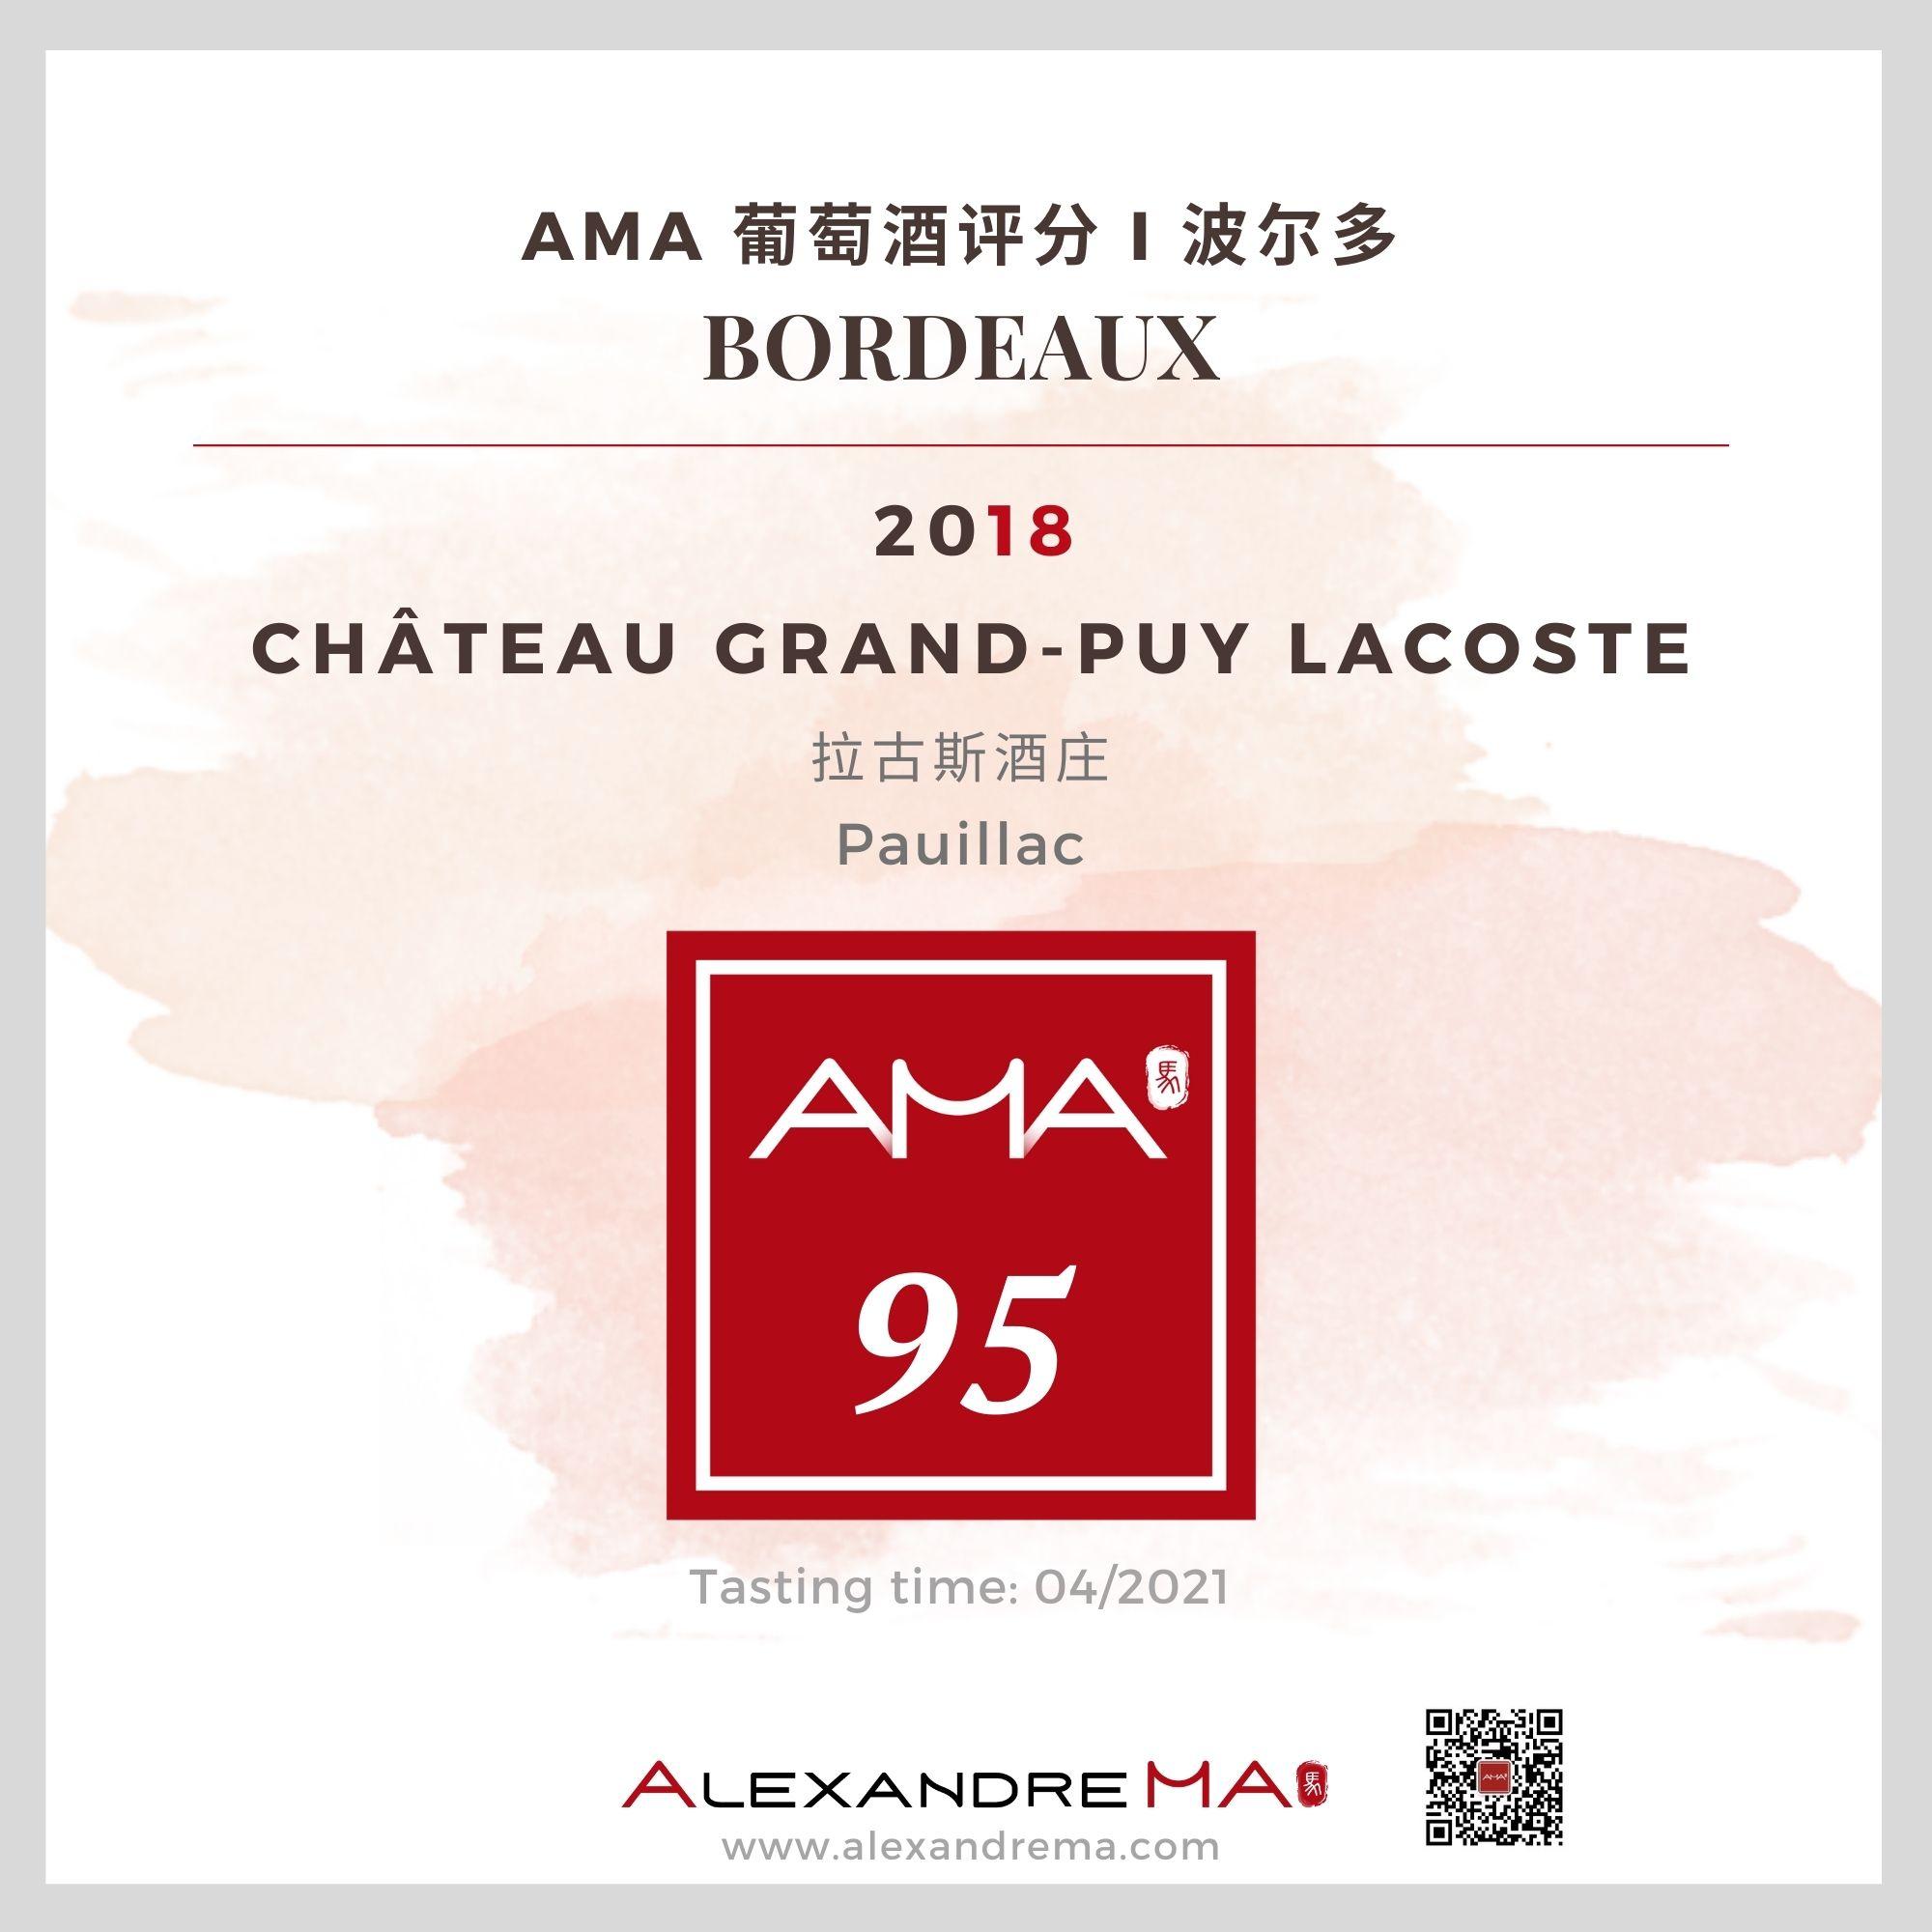 Château Grand-Puy Lacoste 2018 拉古斯酒庄 - Alexandre Ma